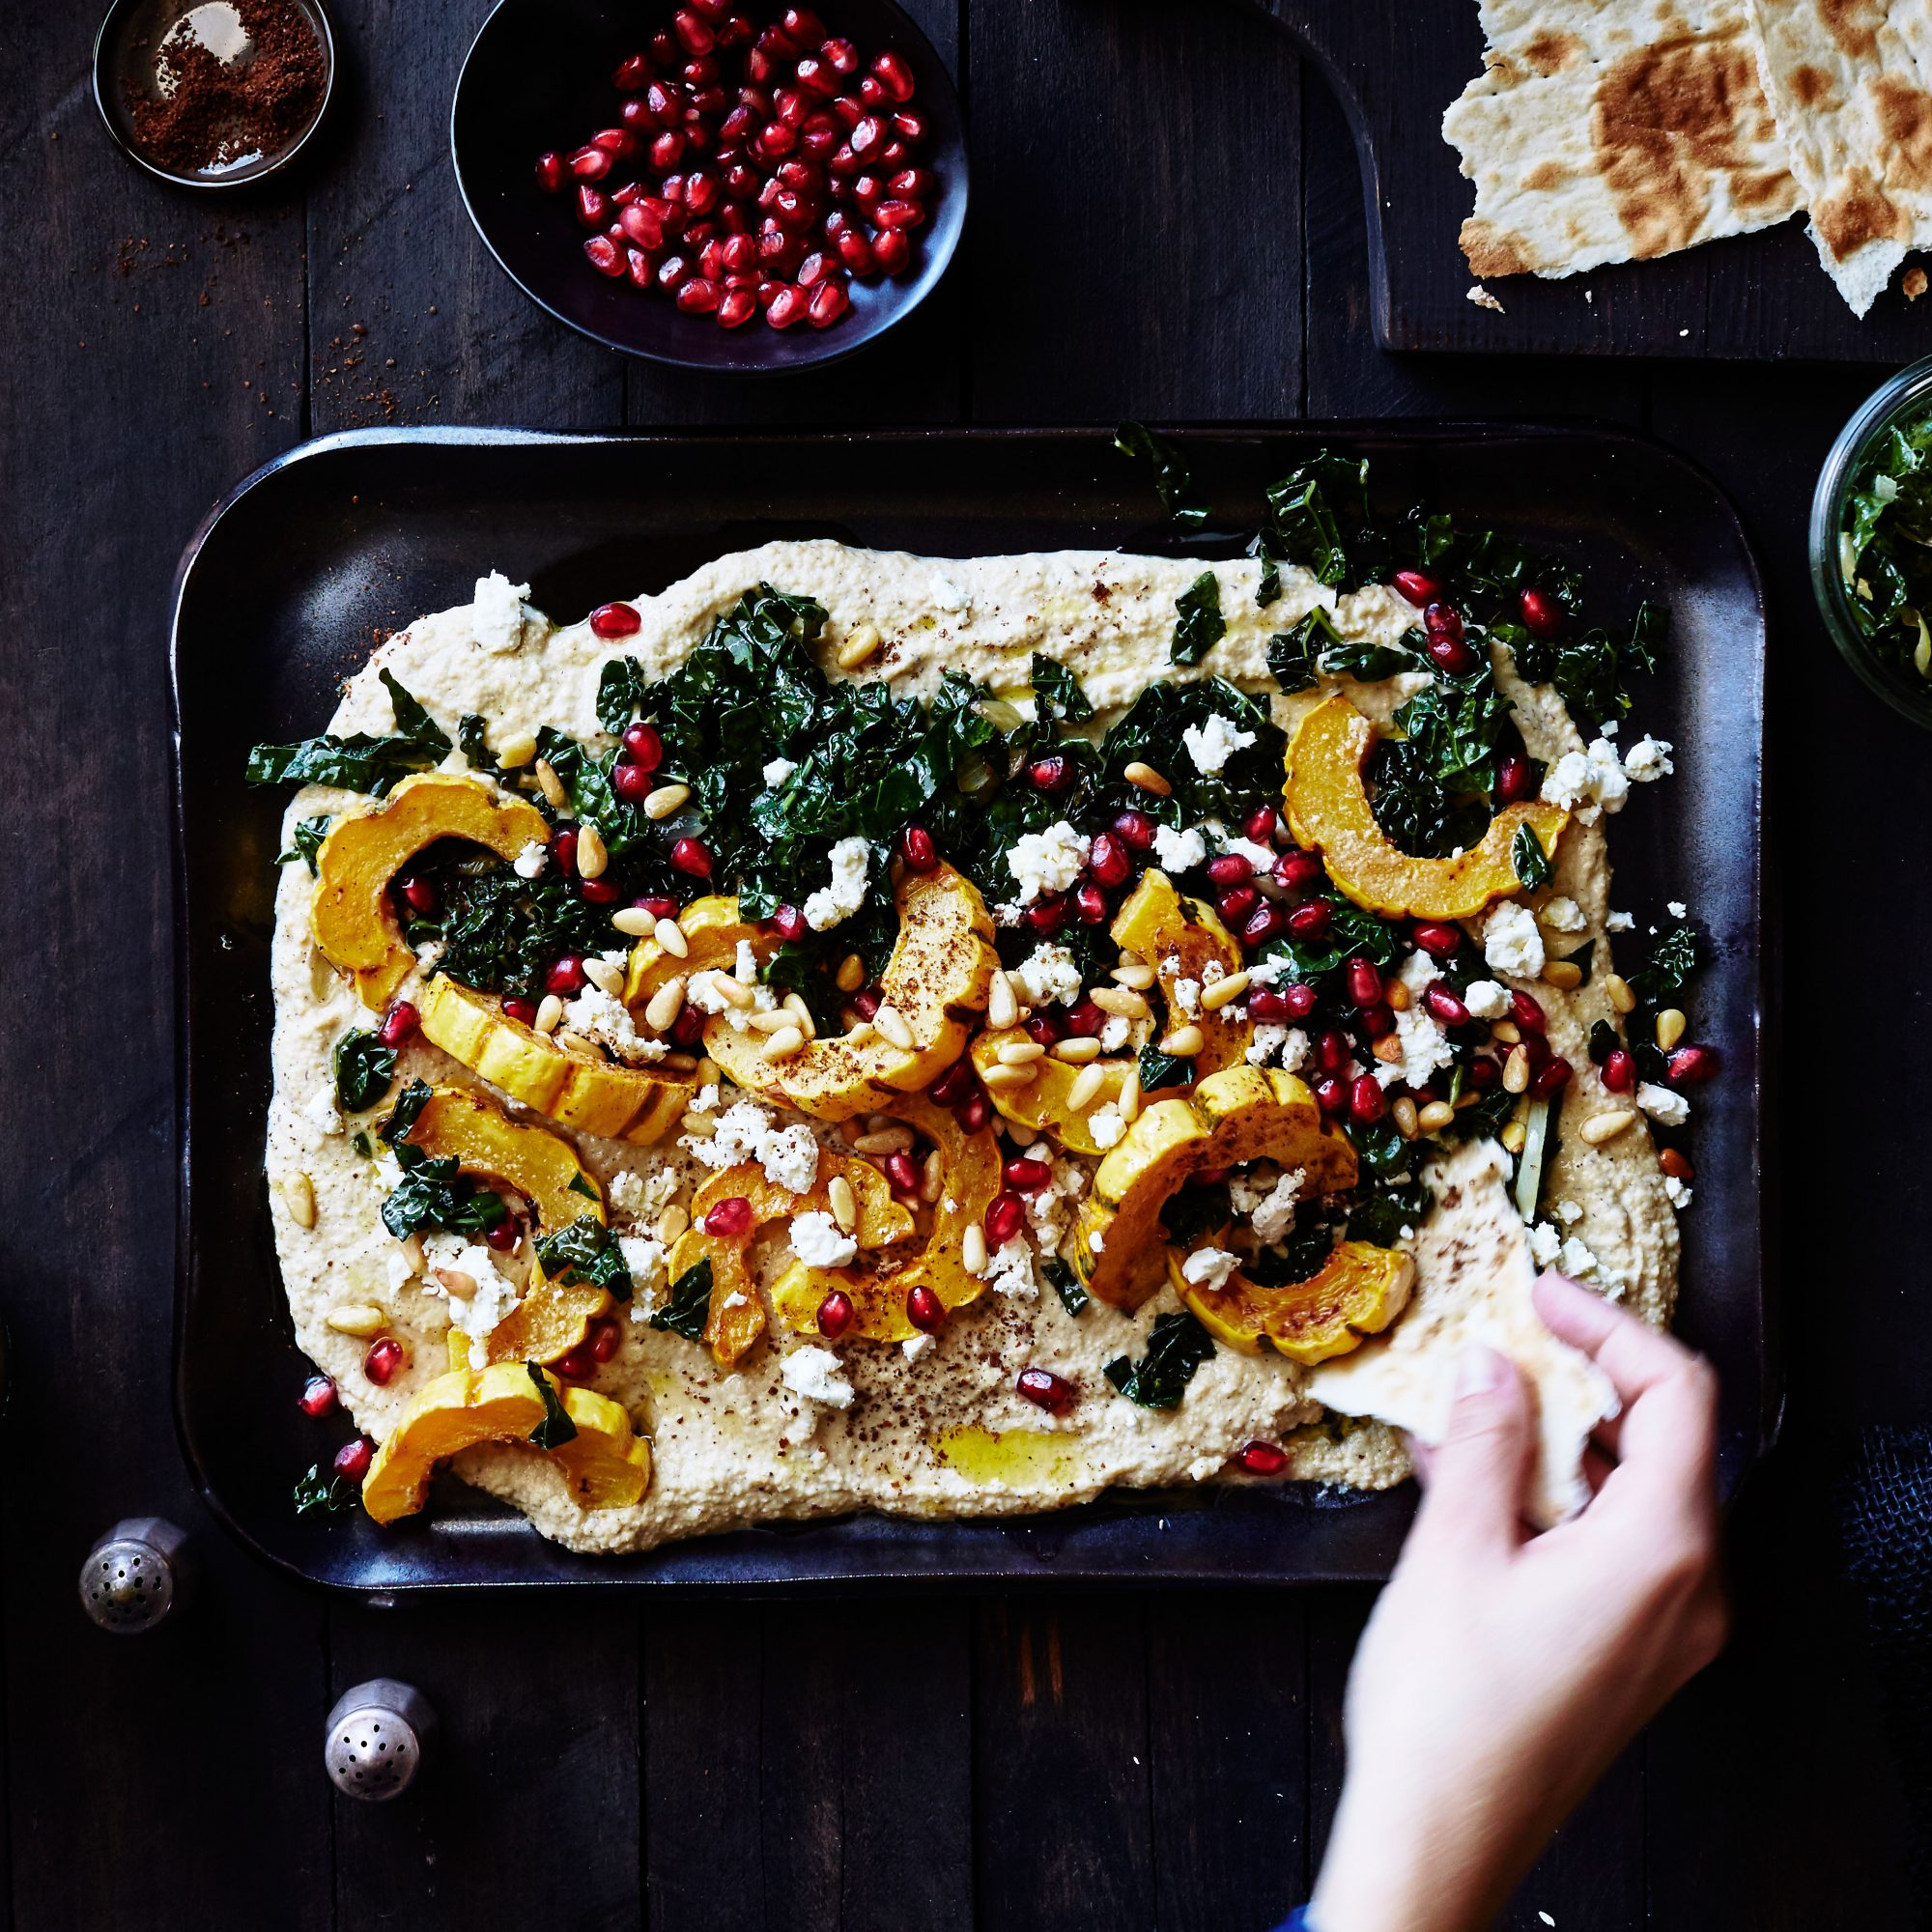 Sumac Hummus with Kale Ribbons and Roasted Delicata Squash